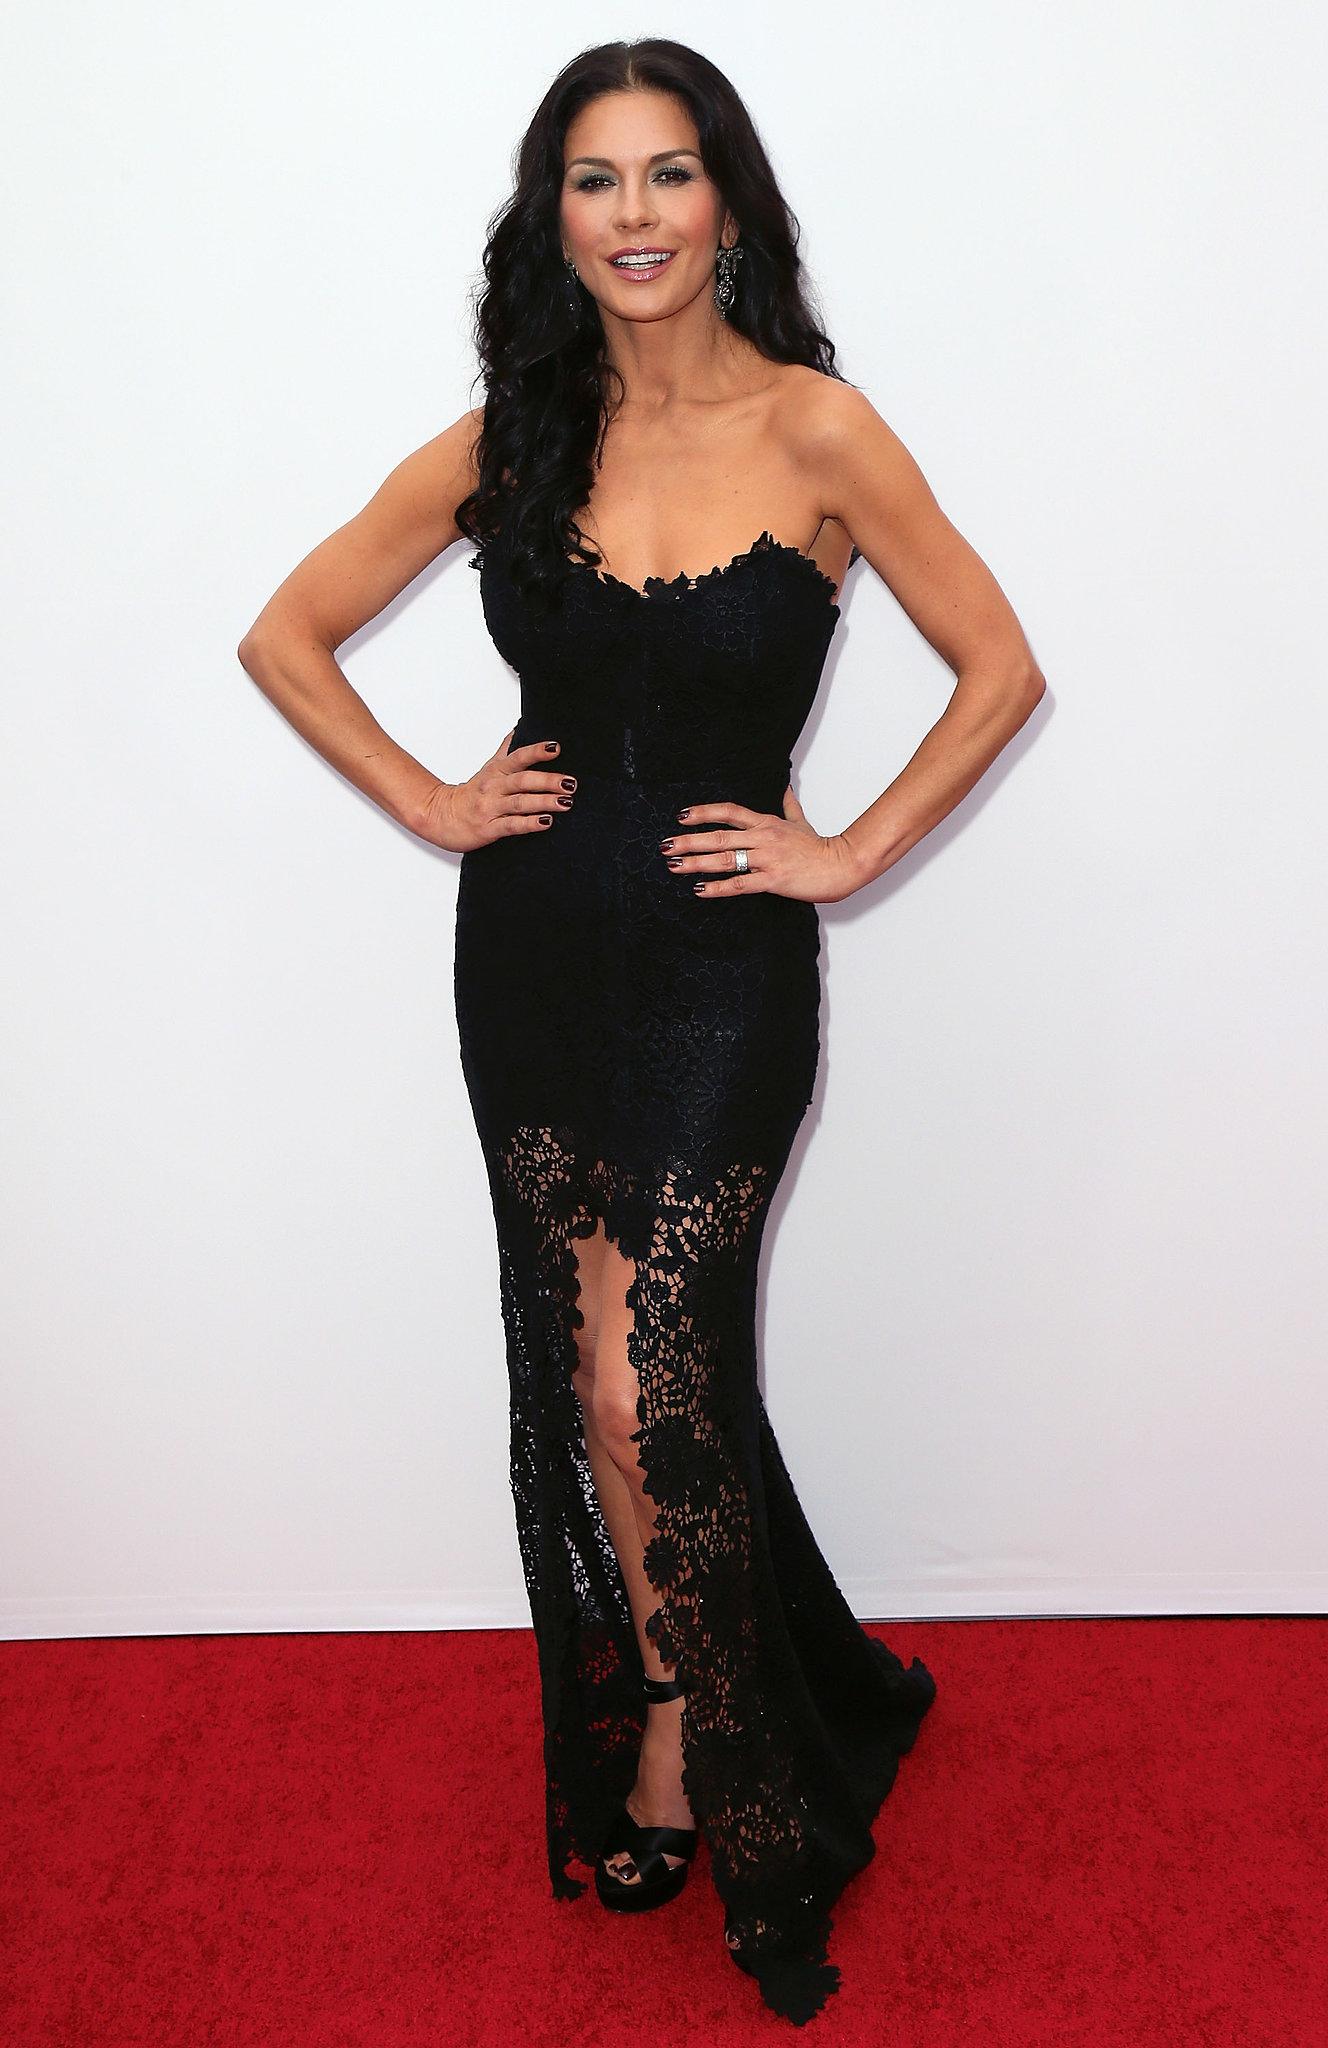 Catherine Zeta-Jones wore a black gown to the premiere.